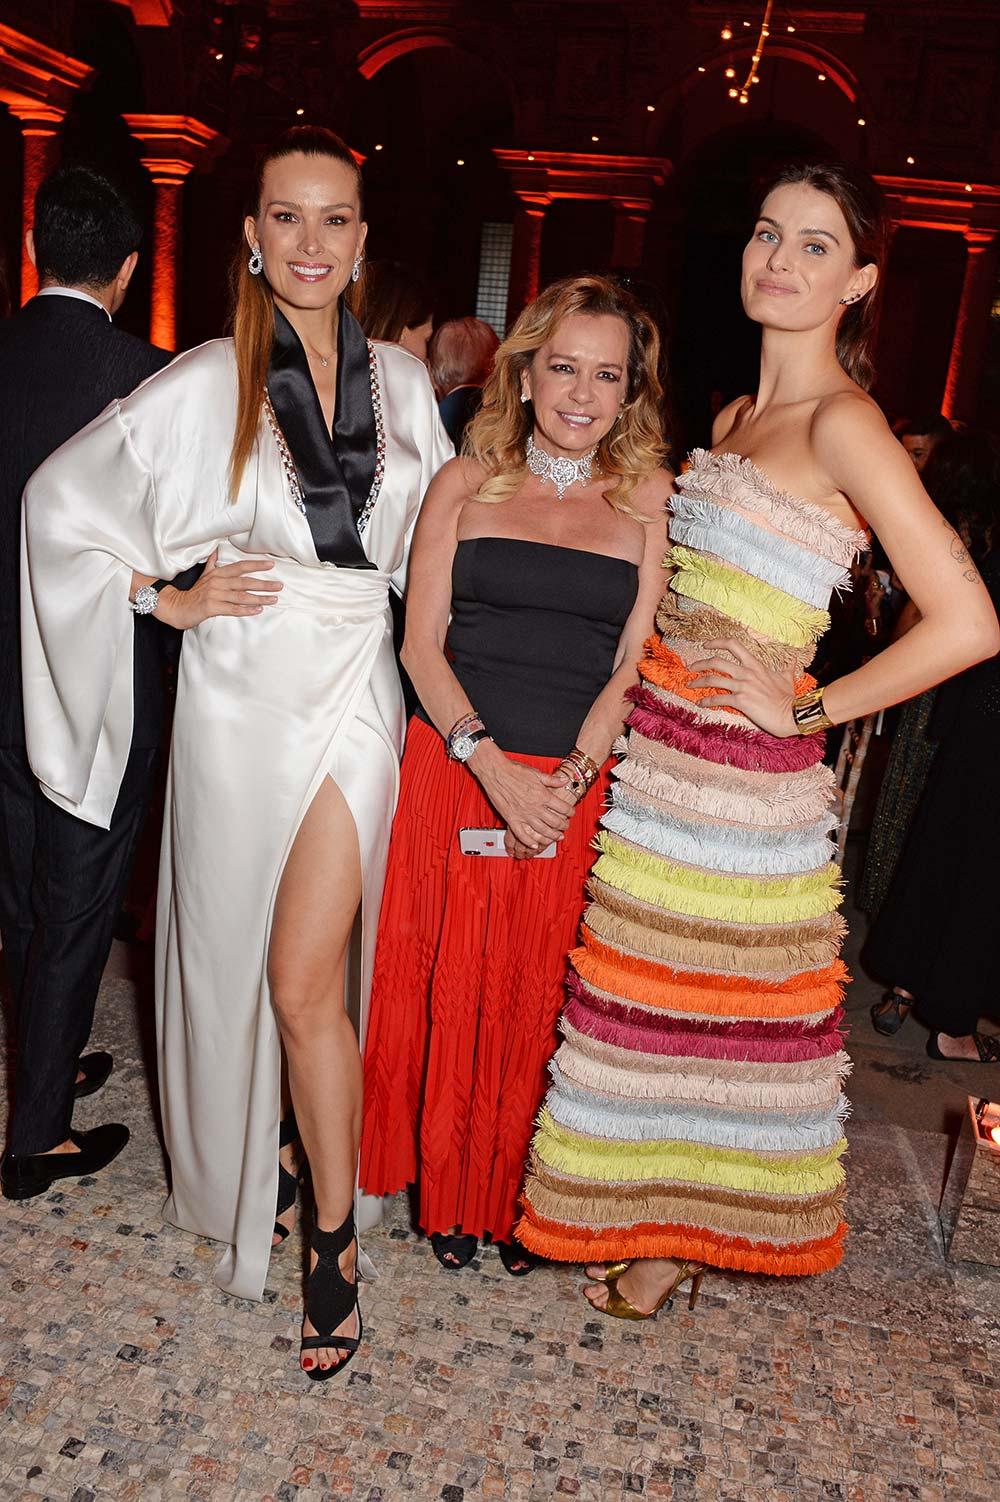 Green Carpet Fashion Awards 2018 - Petra Nemcova and Caroline Scheufele - Hair & Makeup Massimo Serini